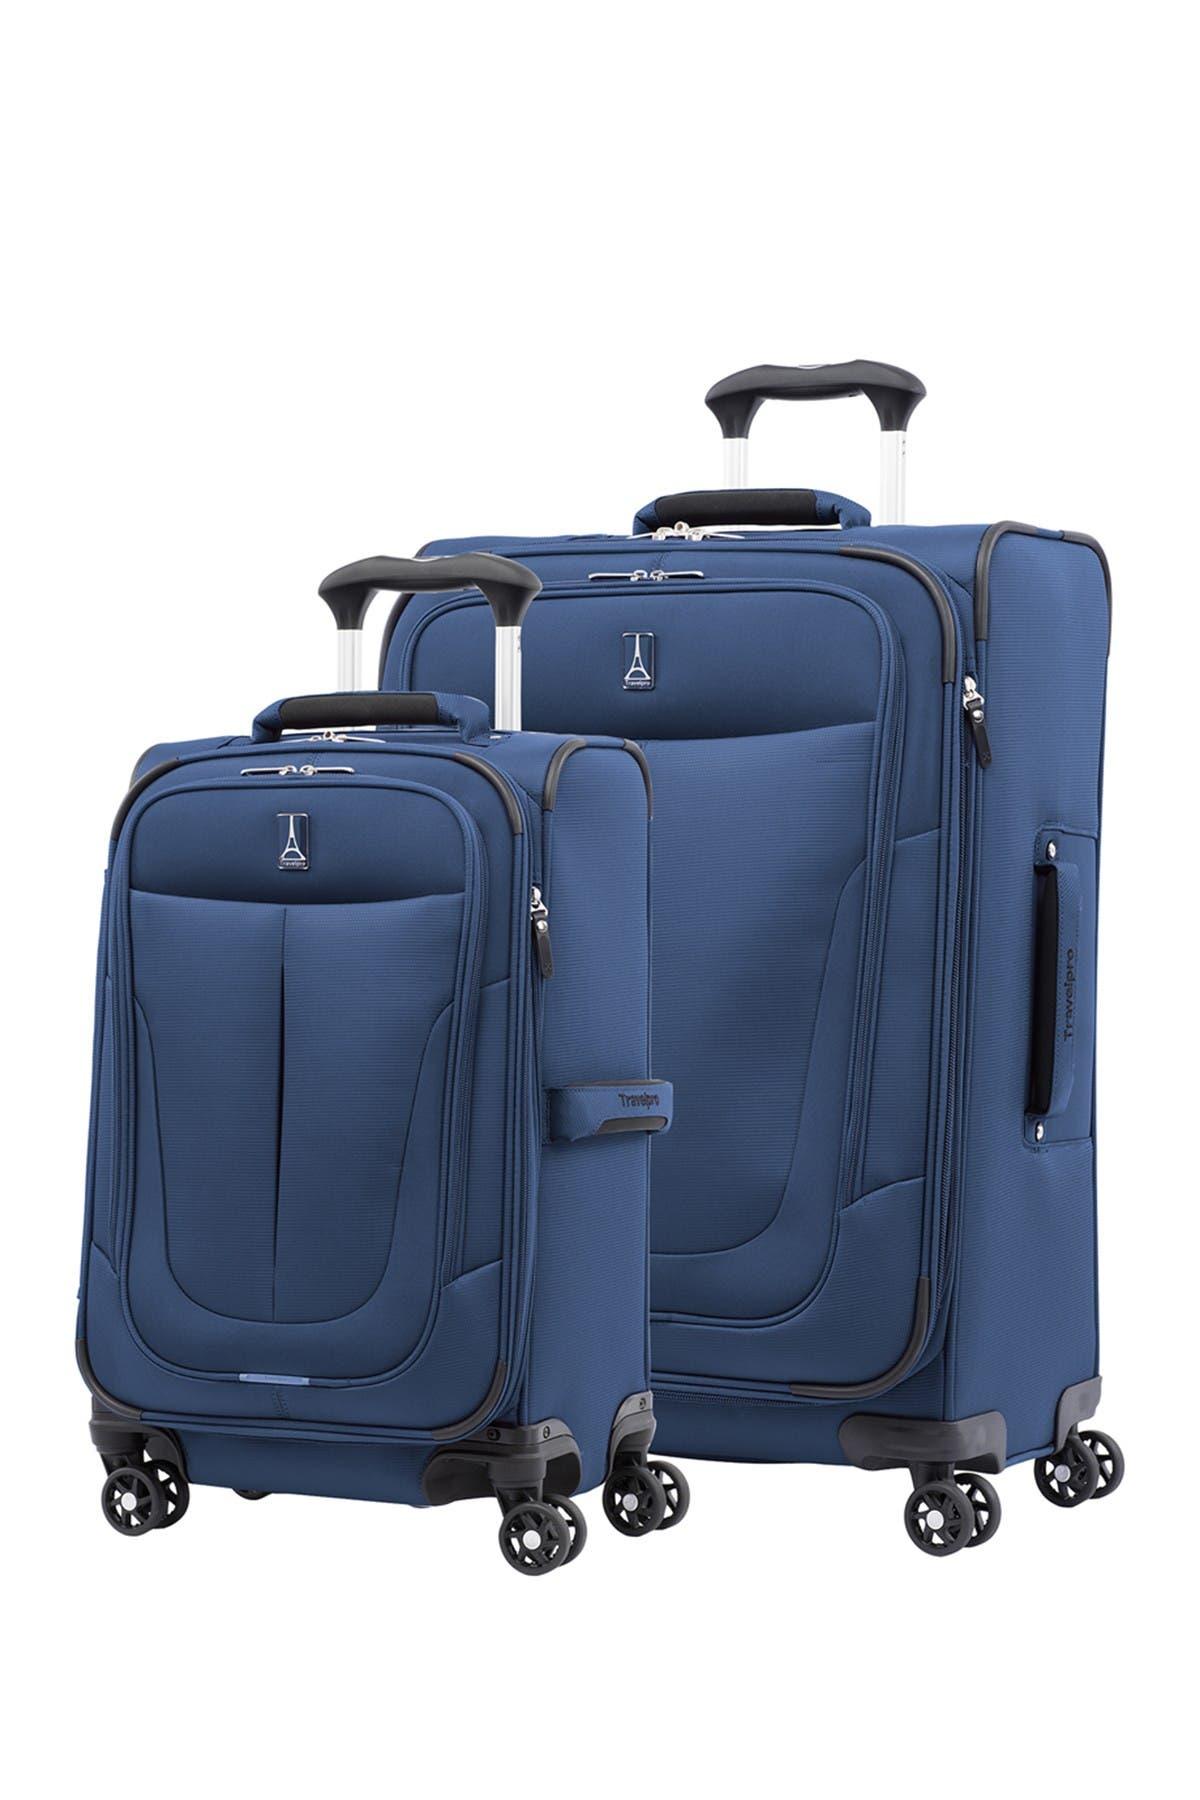 Image of TRAVELPRO Skypro(TM) Expandable 8-Wheel Spinner 2-Piece Set Luggage